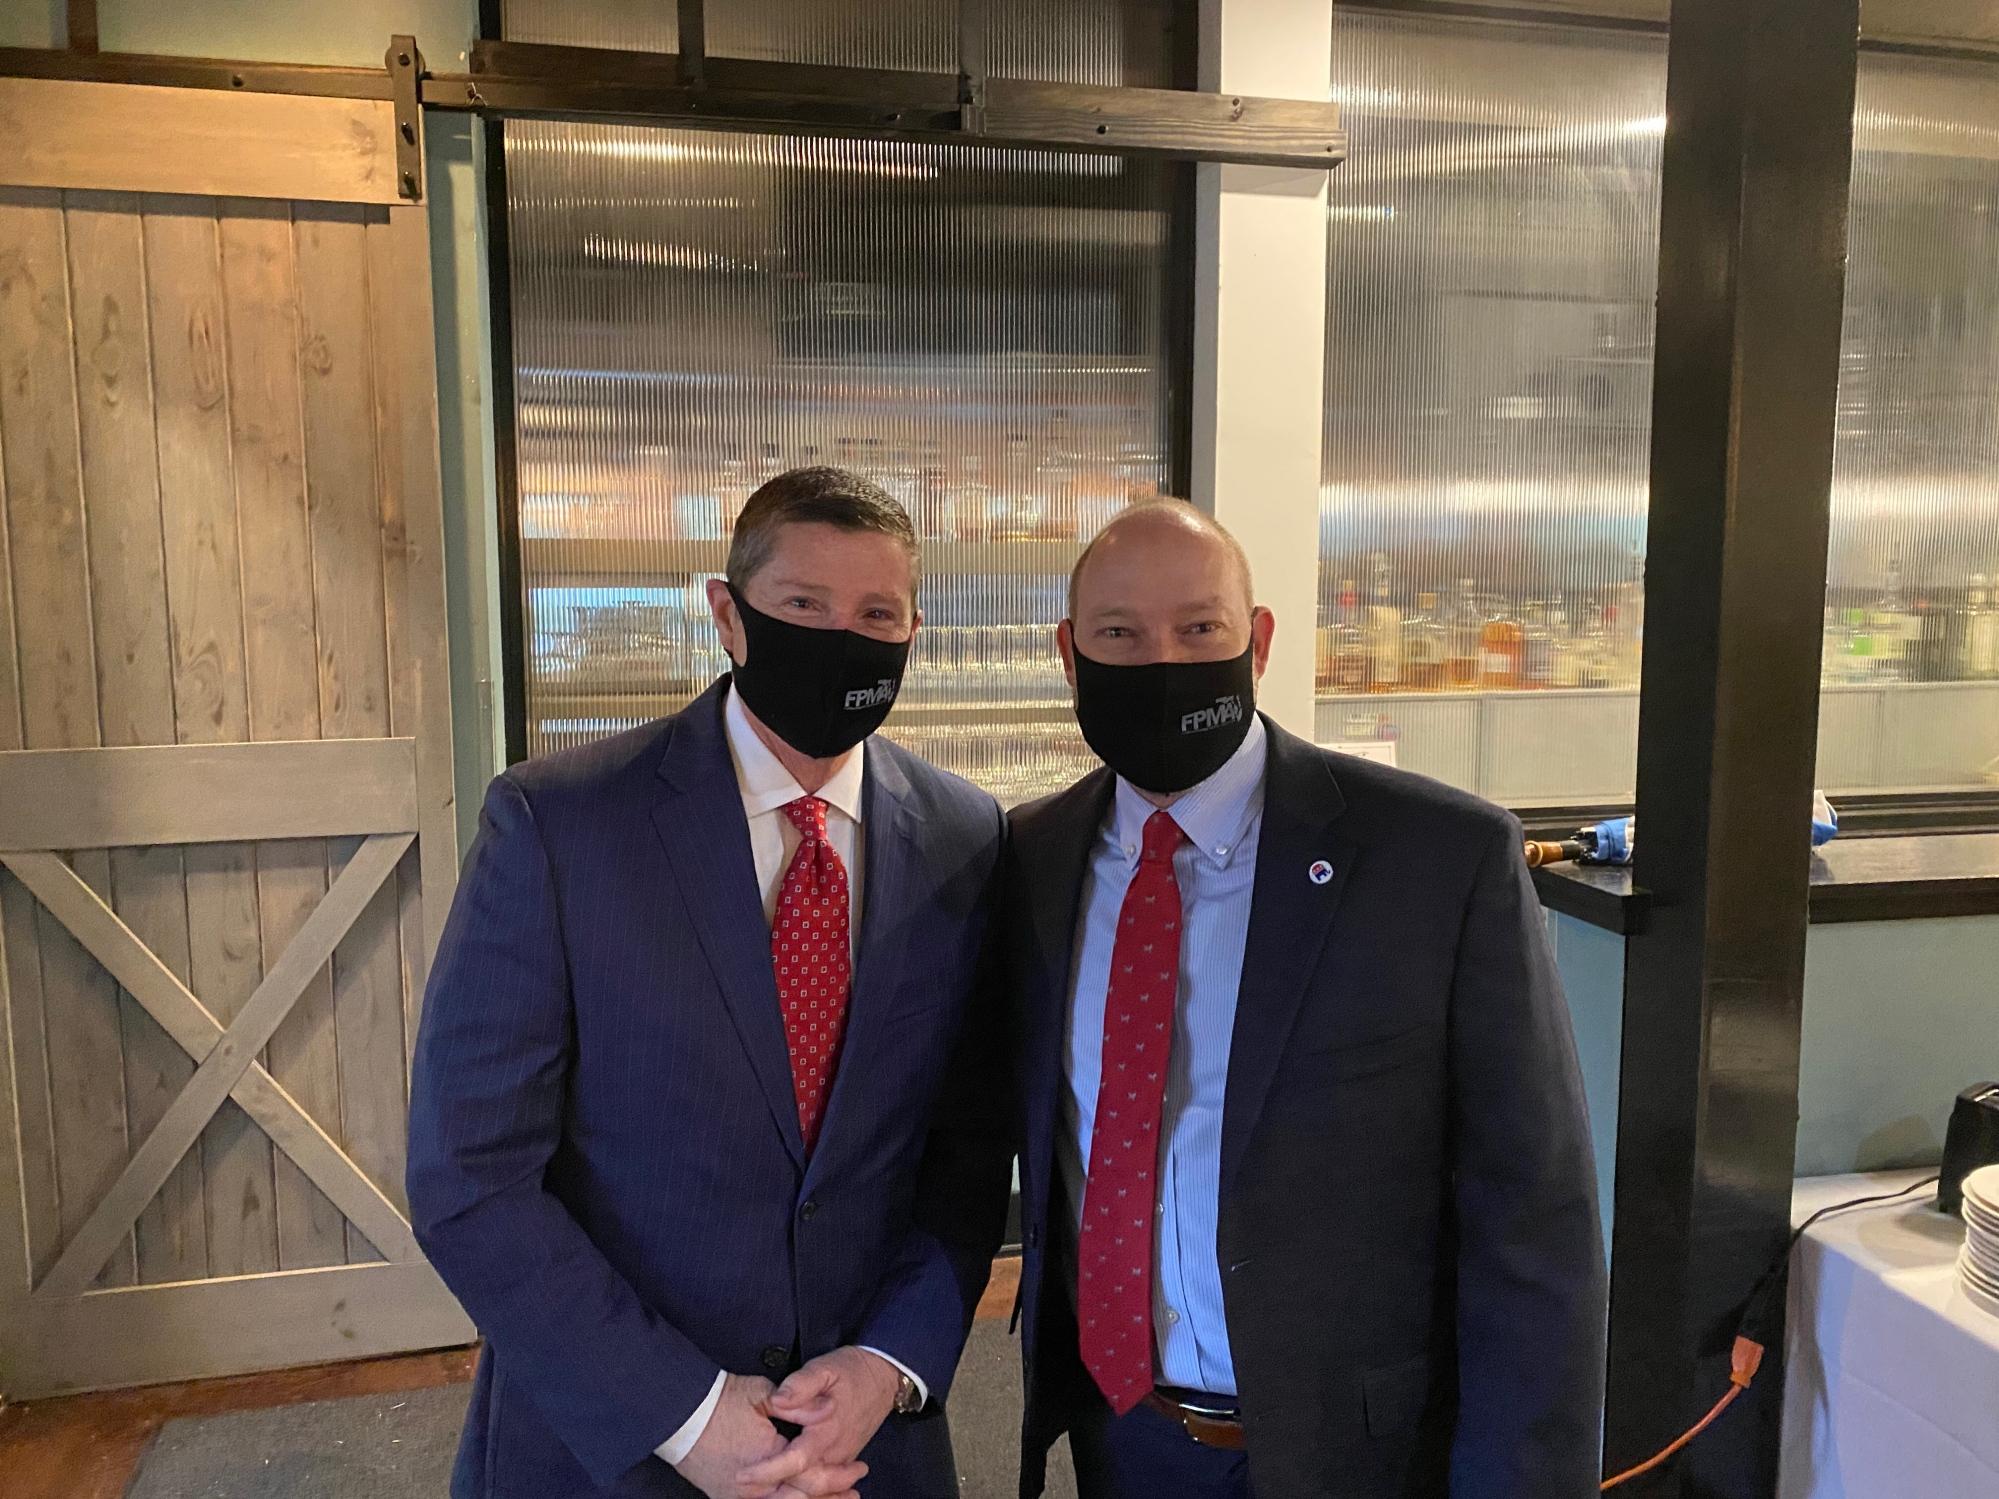 FPMA Lobbyist Chris Hansen with Rep. Spencer Roach